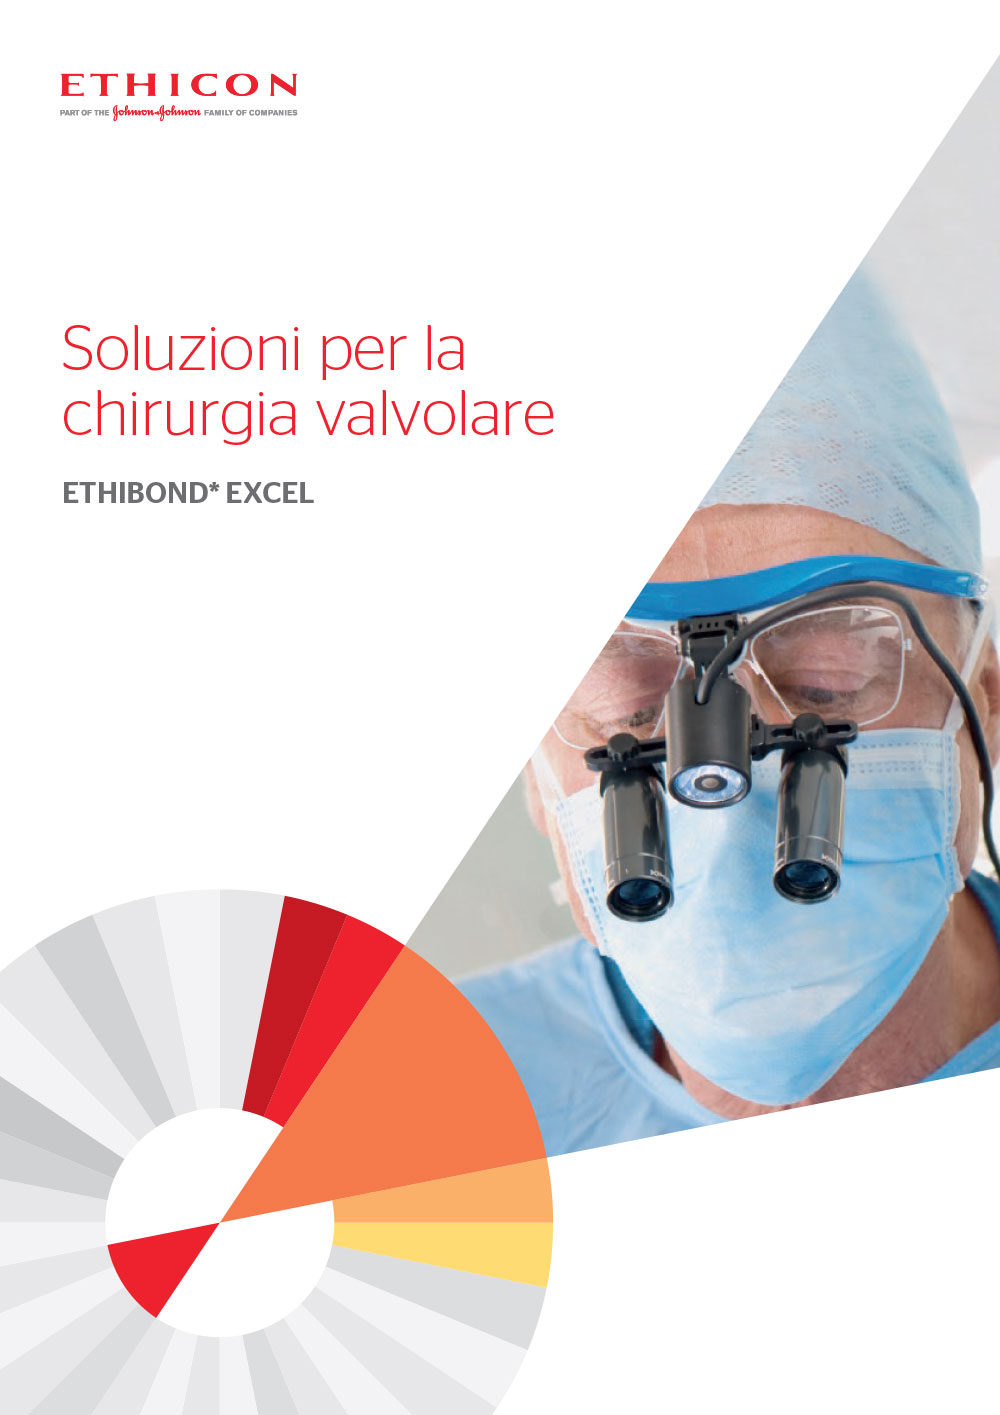 https://www.minicardiacsurgery-univpm-research.com/wp-content/uploads/2021/05/ETHIBOND-per-chirurgia-valvolare.jpg